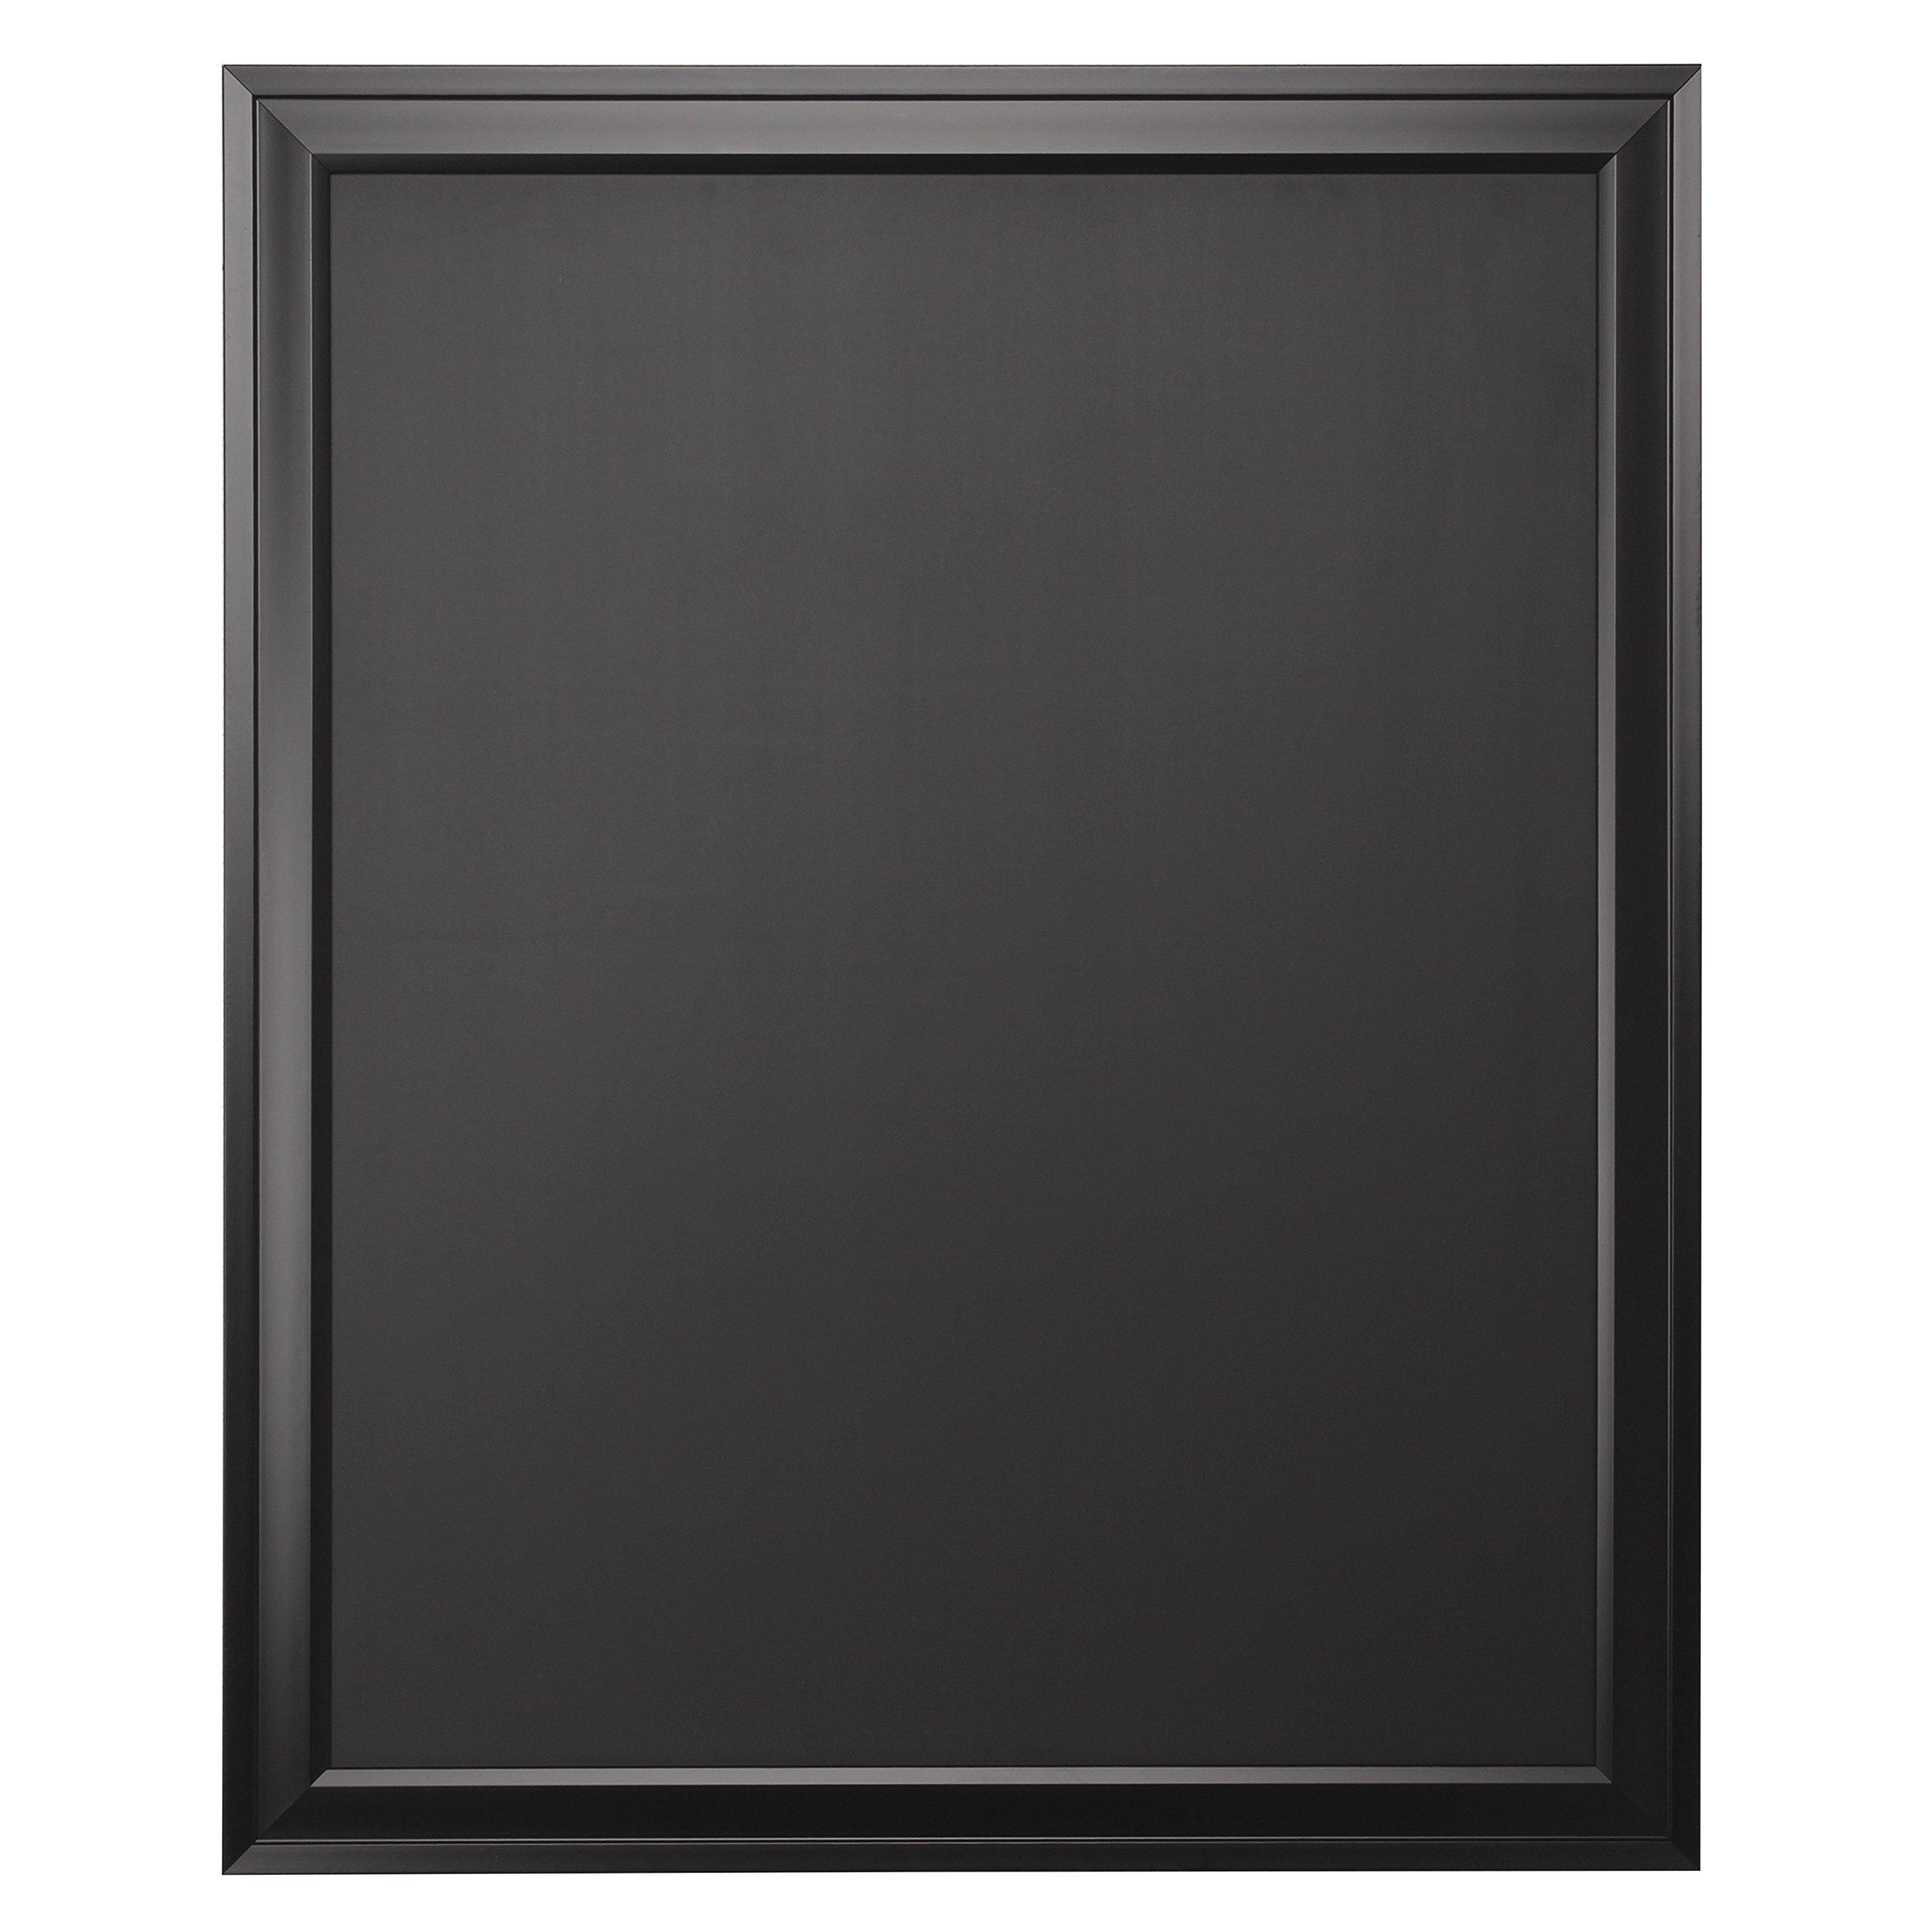 DesignOvation Bosc Wall Mounted Framed Magnetic Chalkboard, 27.5x33.5, Black by DesignOvation